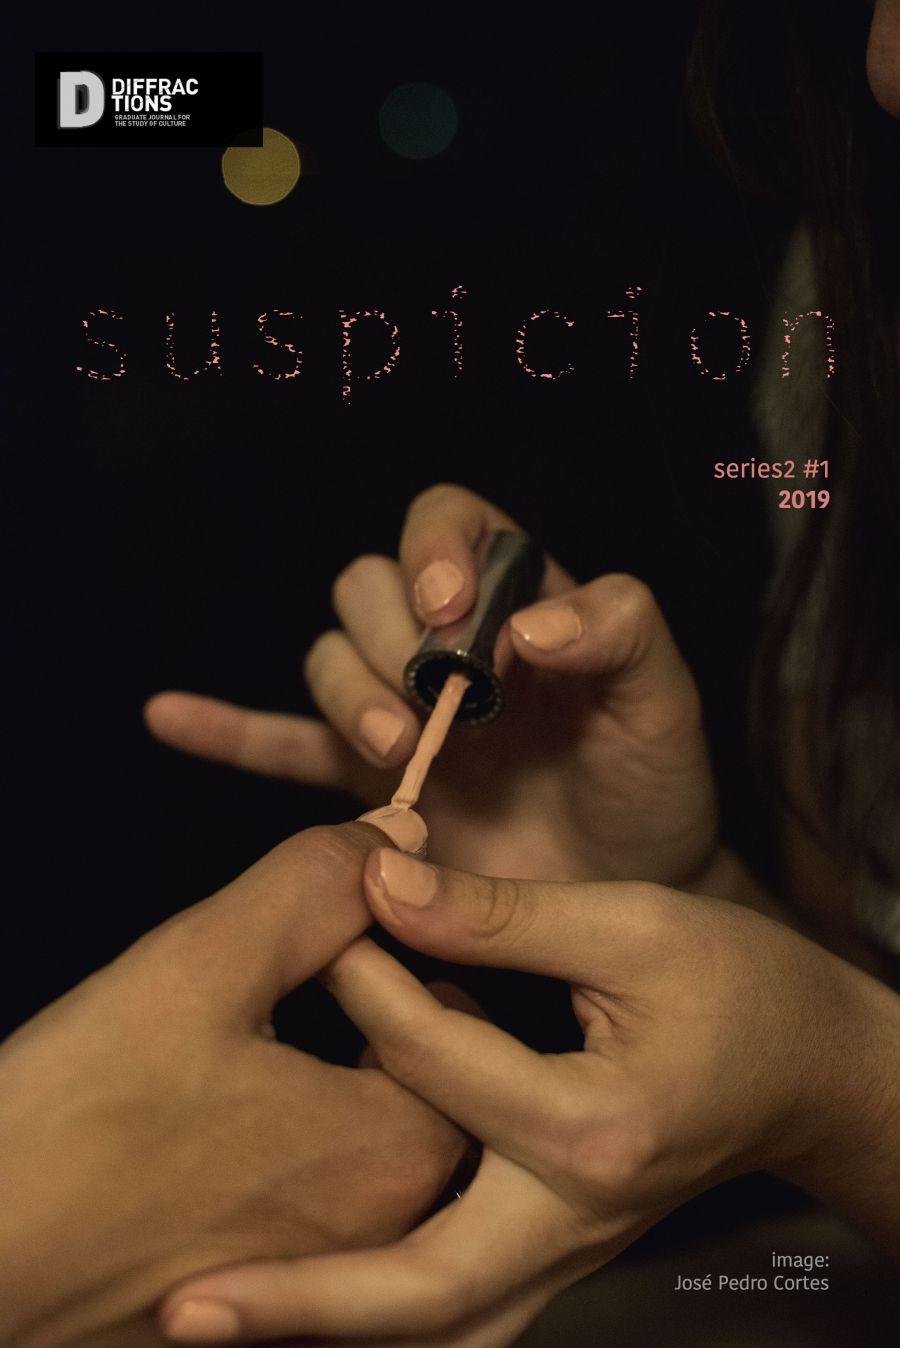 Out of Suspicion | Lançamento da revista Diffractions